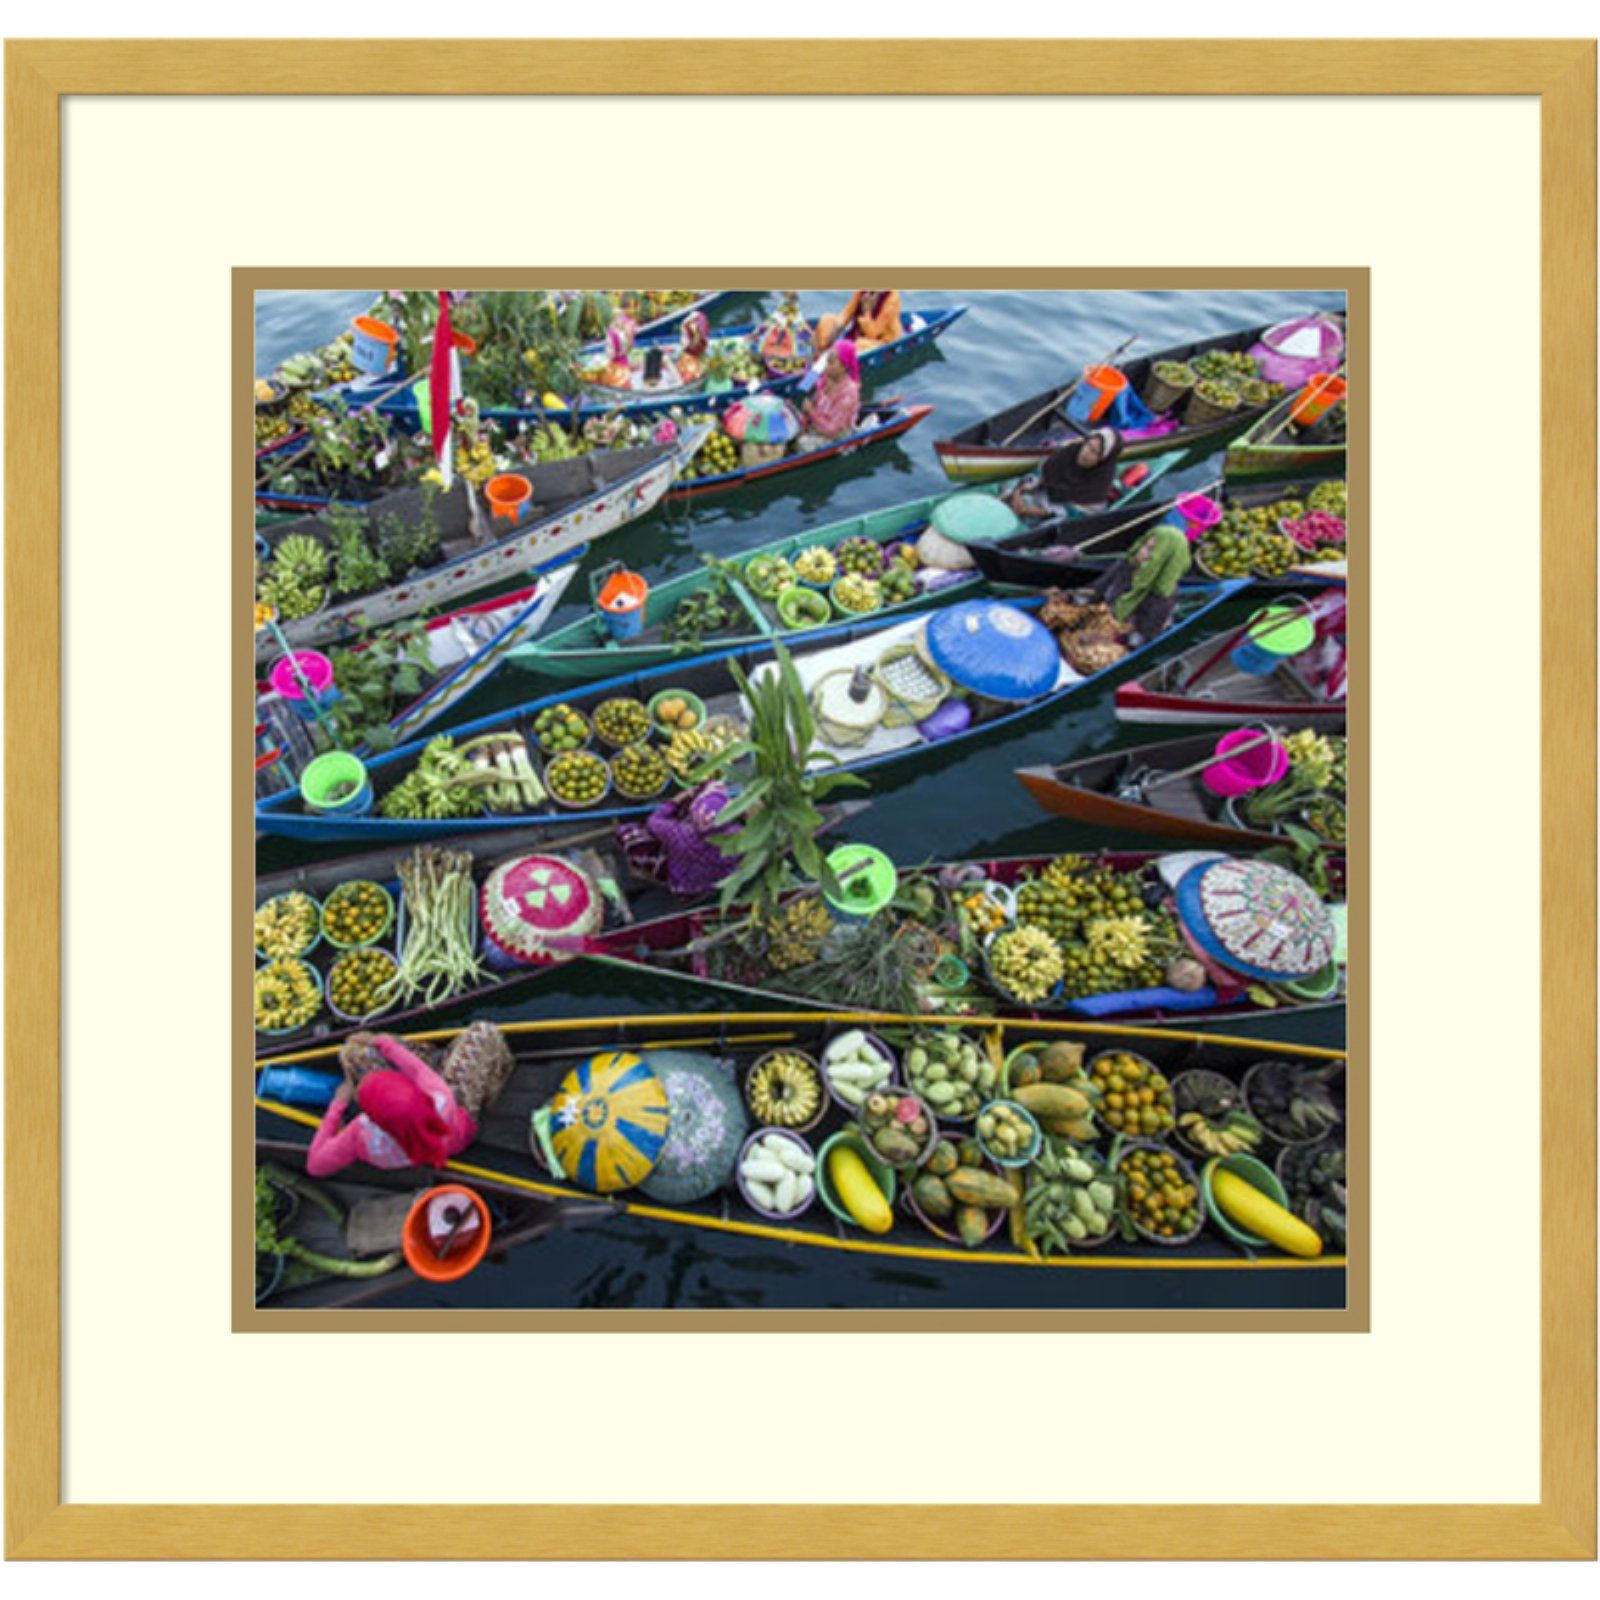 Amanti Art Banjarmasin Floating Market Framed Wall Art By Fauzan Maududdin Framed Art Prints Amanti Art Art